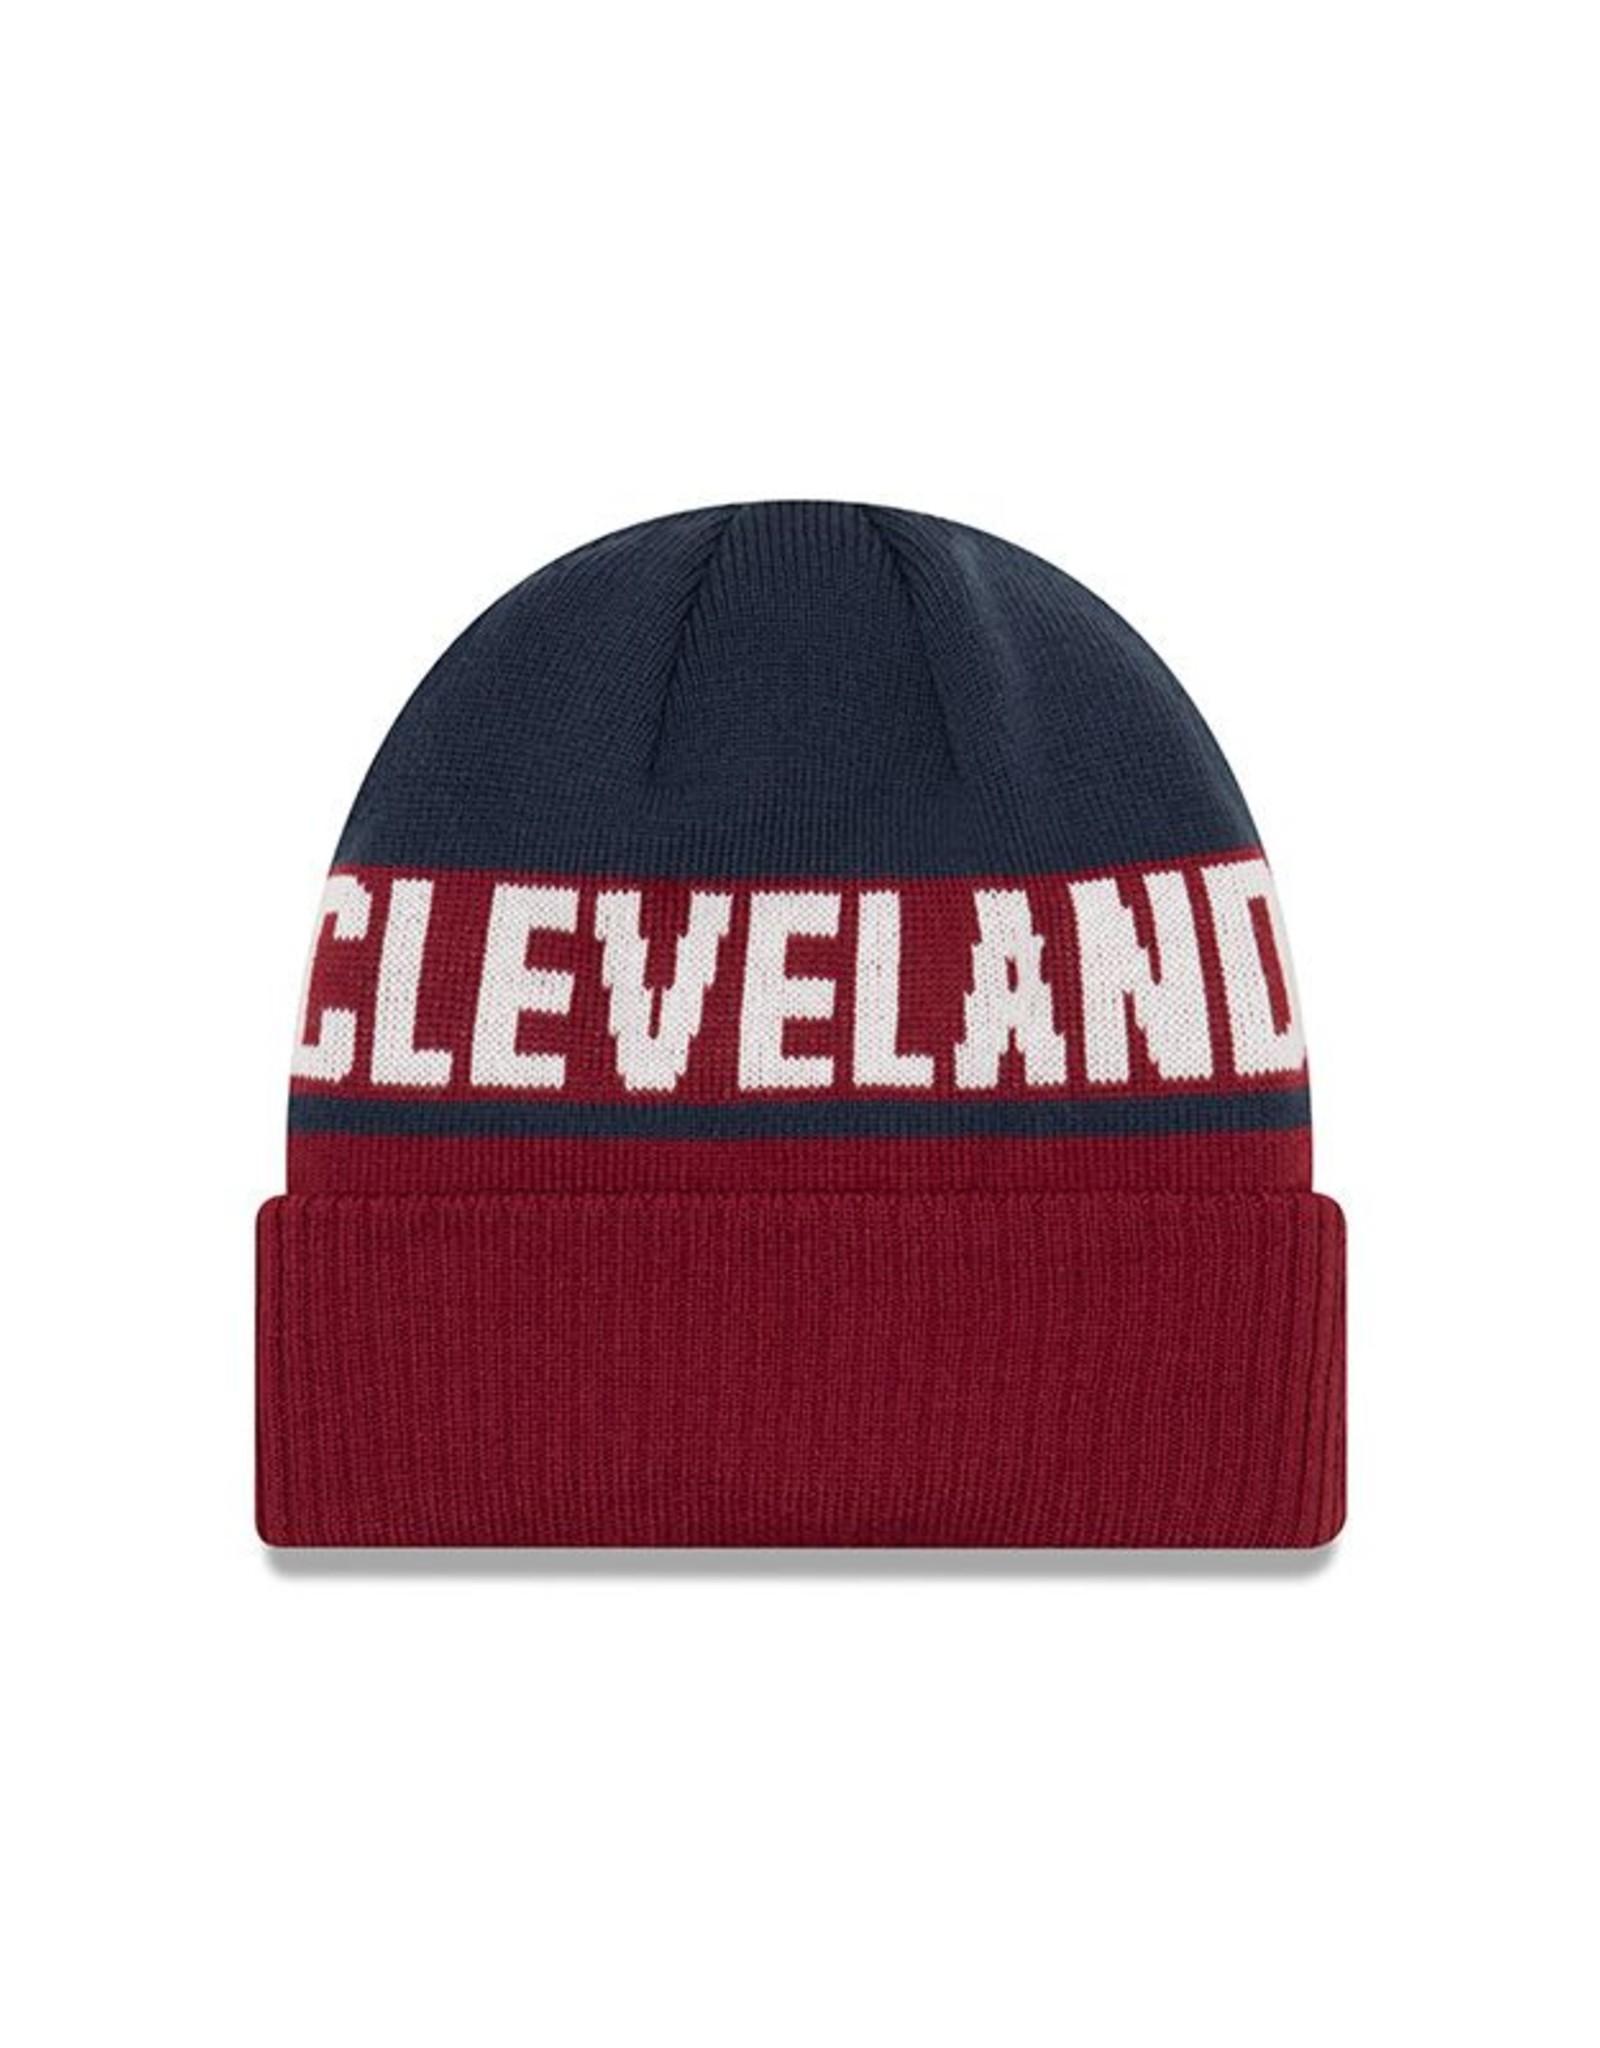 NEW ERA Cleveland Cavaliers Chilled Cuff Knit Hat